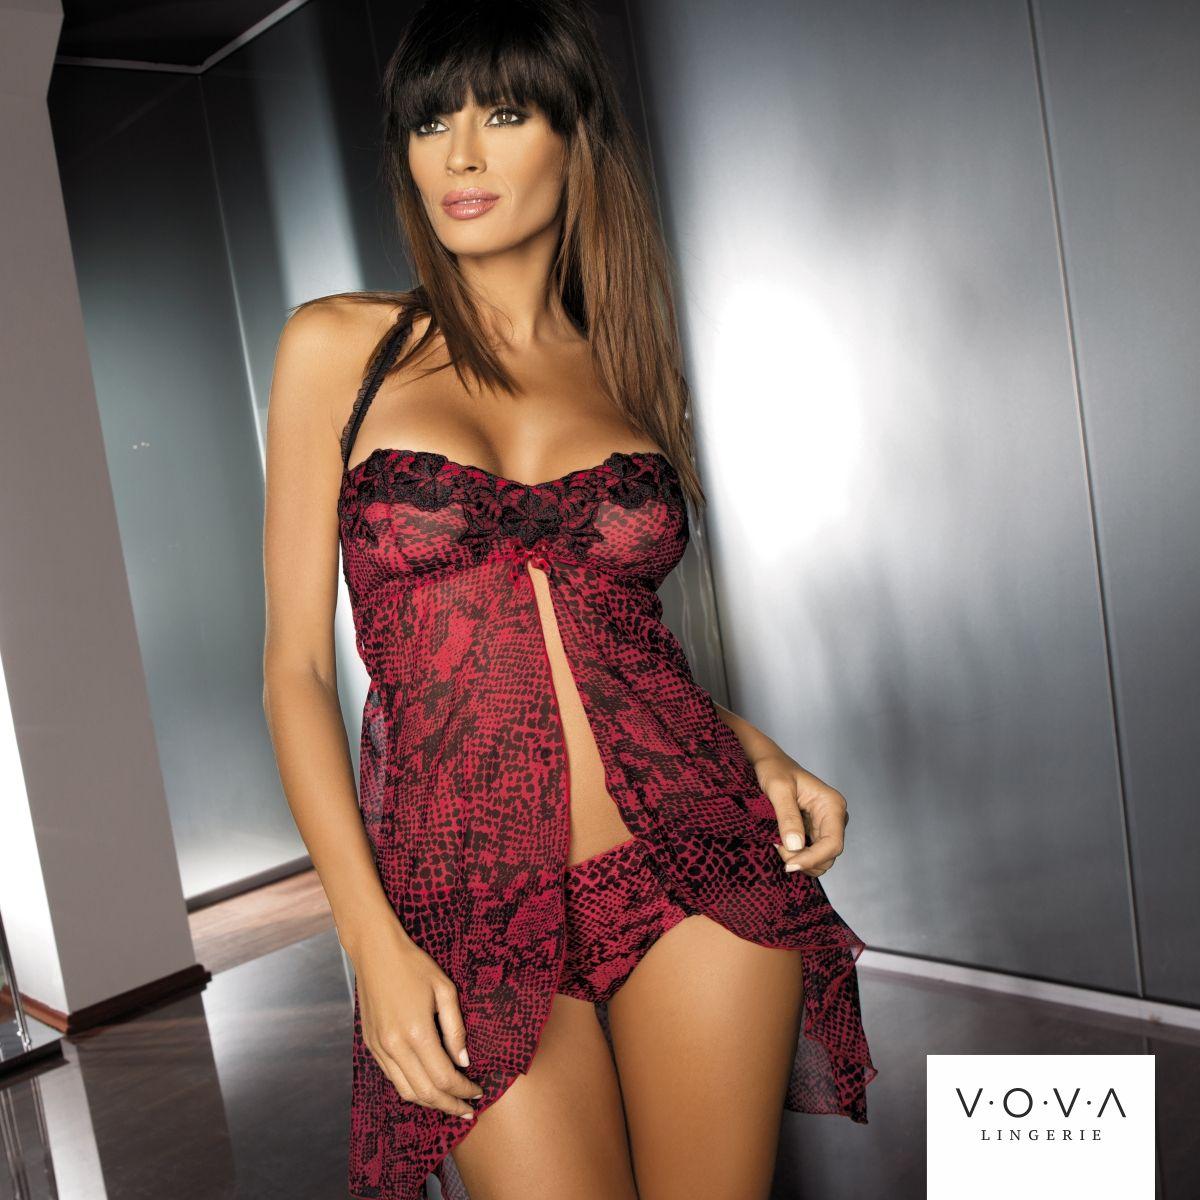 «MILEDY» www.vova-lingerie.eu #lingerie #sexylingerie #underwear #белье #нижнеебелье #apatiniai #apatinistrikotazas #naktiniai #nightgown #vova #vovalingerie